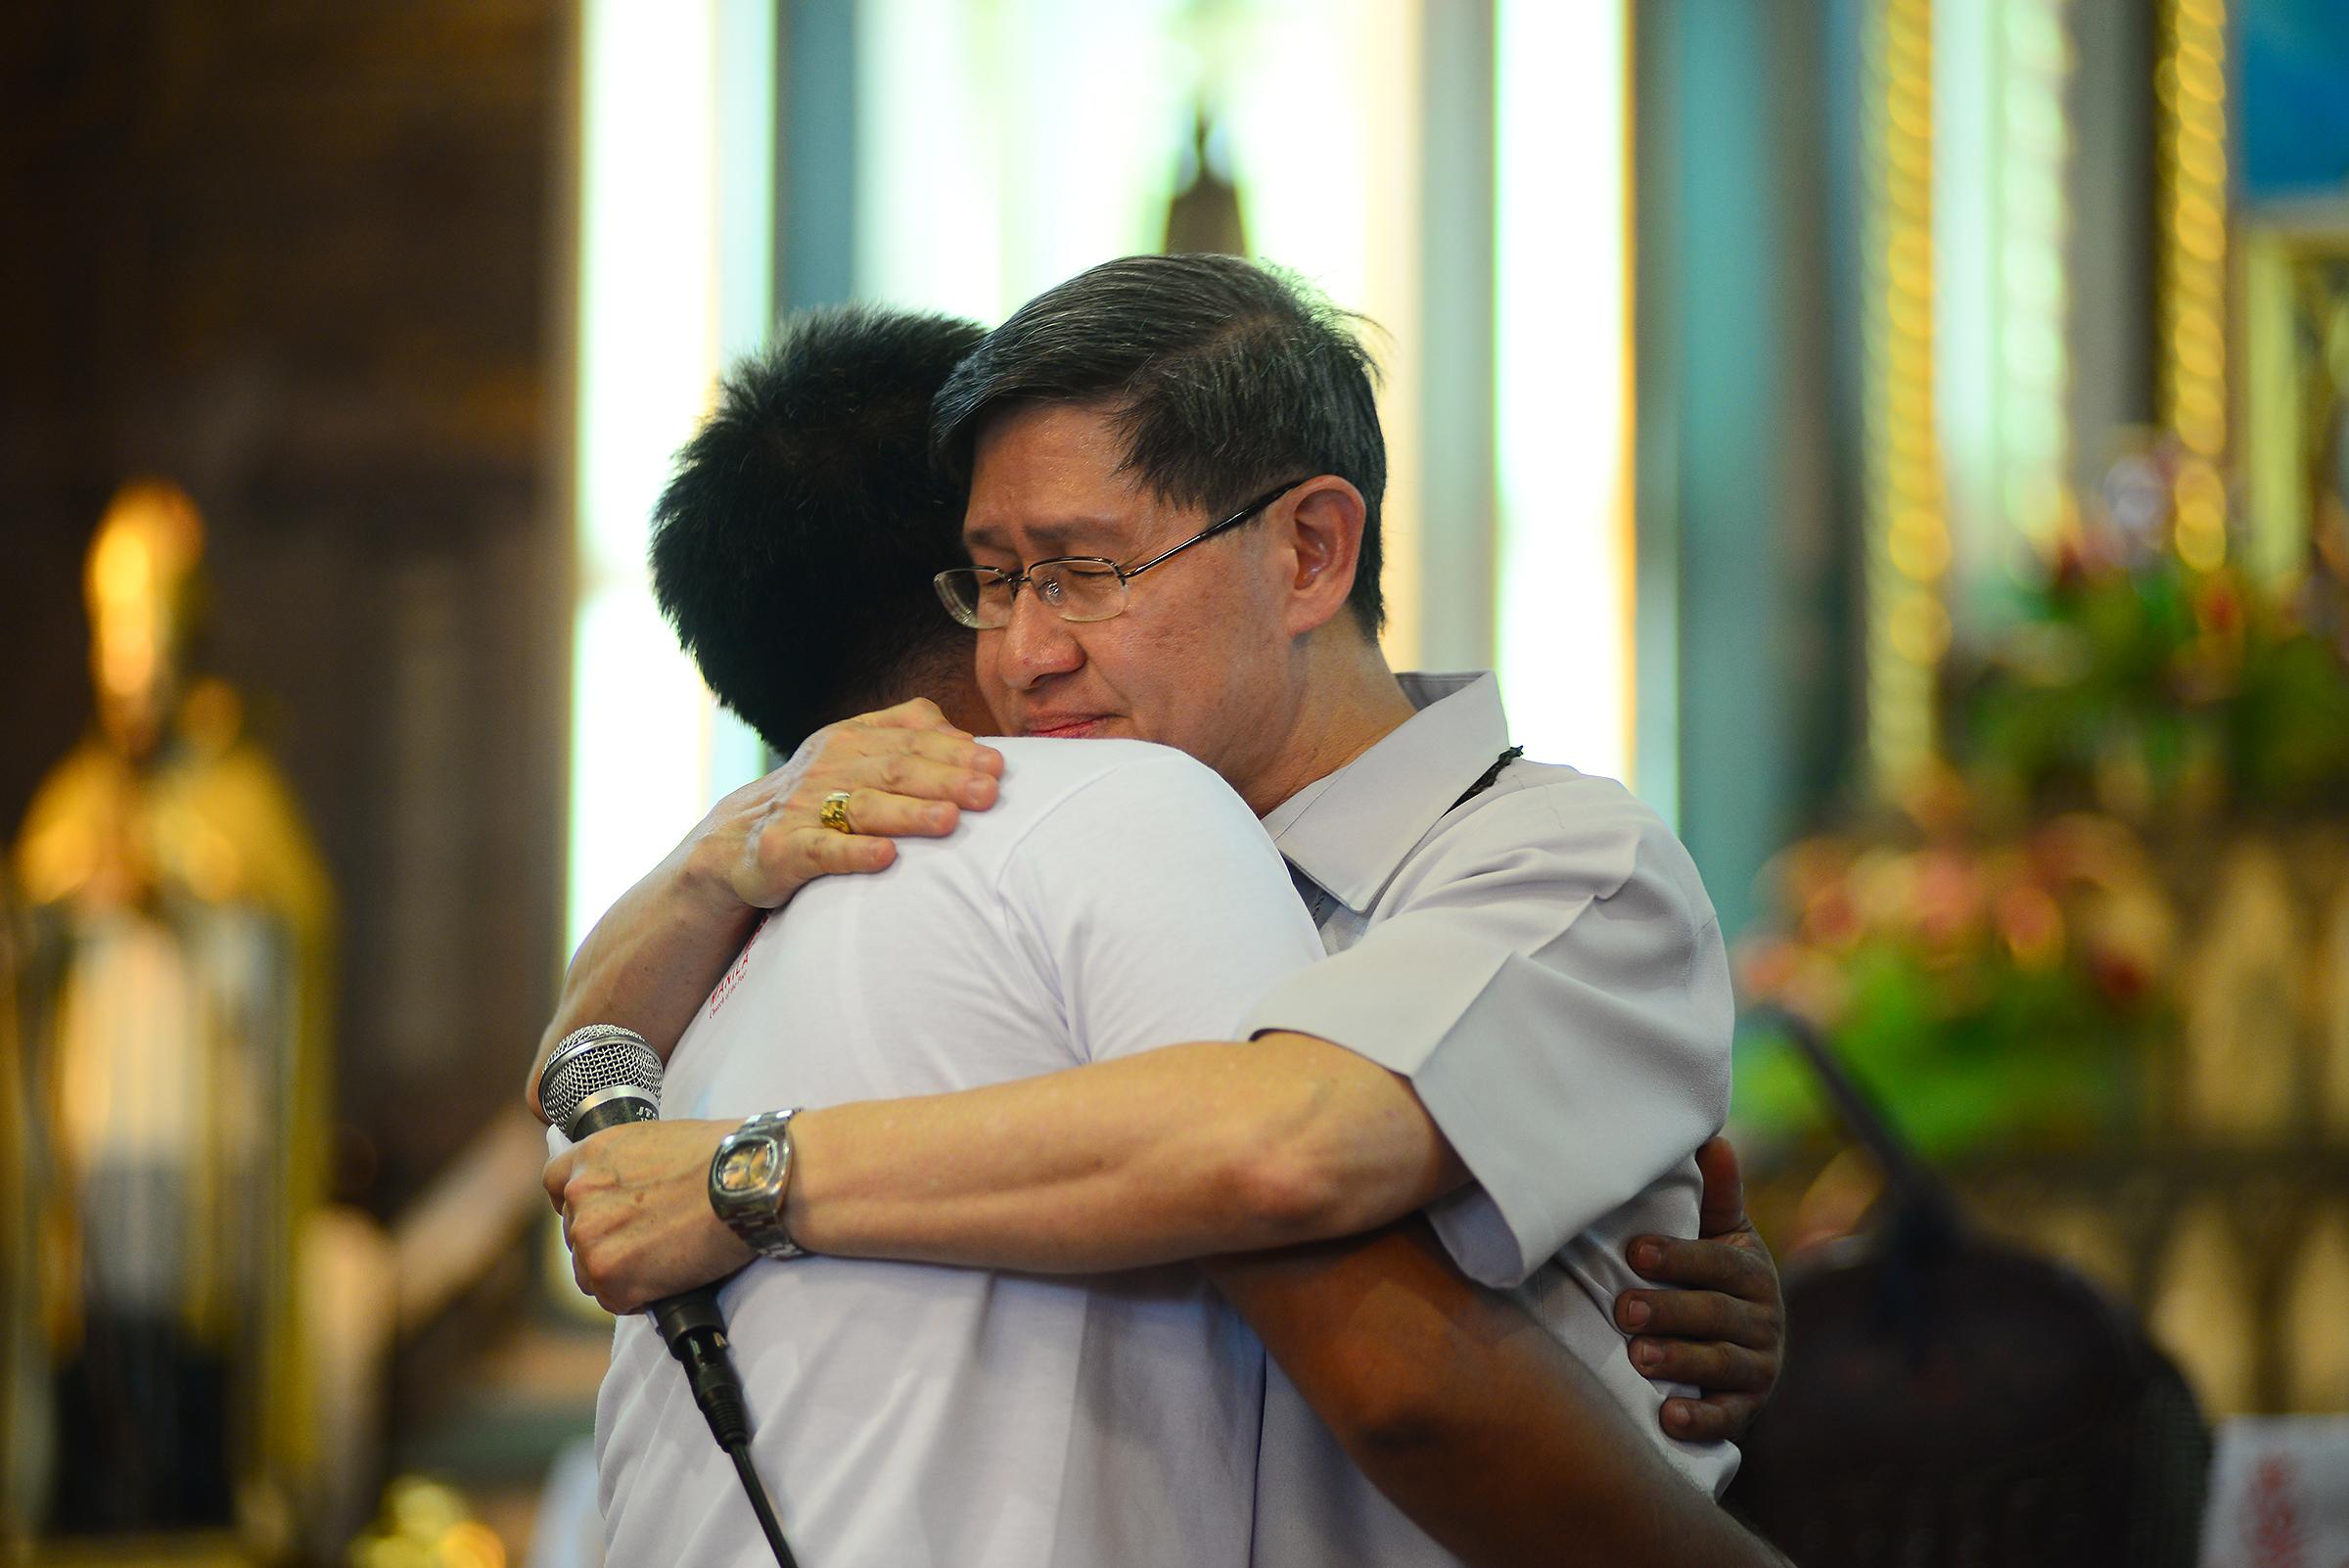 'YOU'RE NOT HOPELESS'. Cardinal Tagle hugs a Sanlakbay graduate on October 21, 2017. Photo by Maria Tan/Rappler